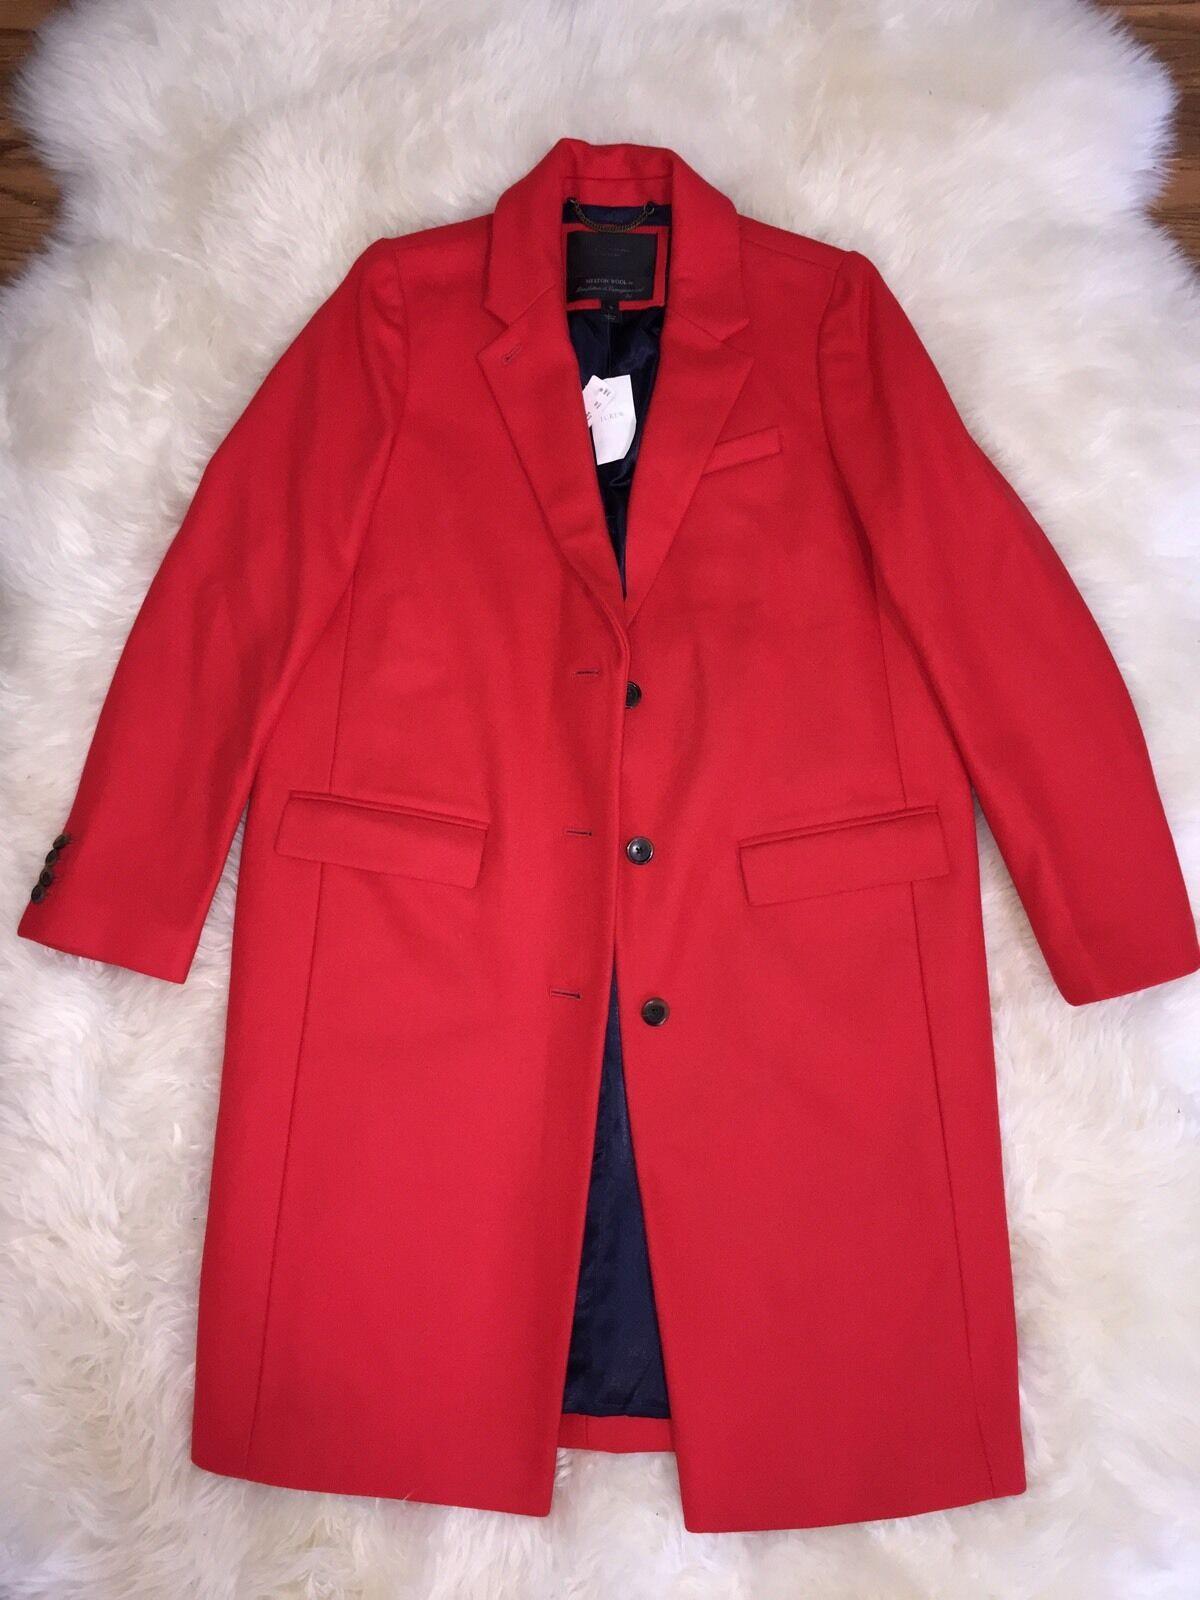 JCrew Wool Melton Topcoat Coat  B3906  Brilliant Flame Red 10